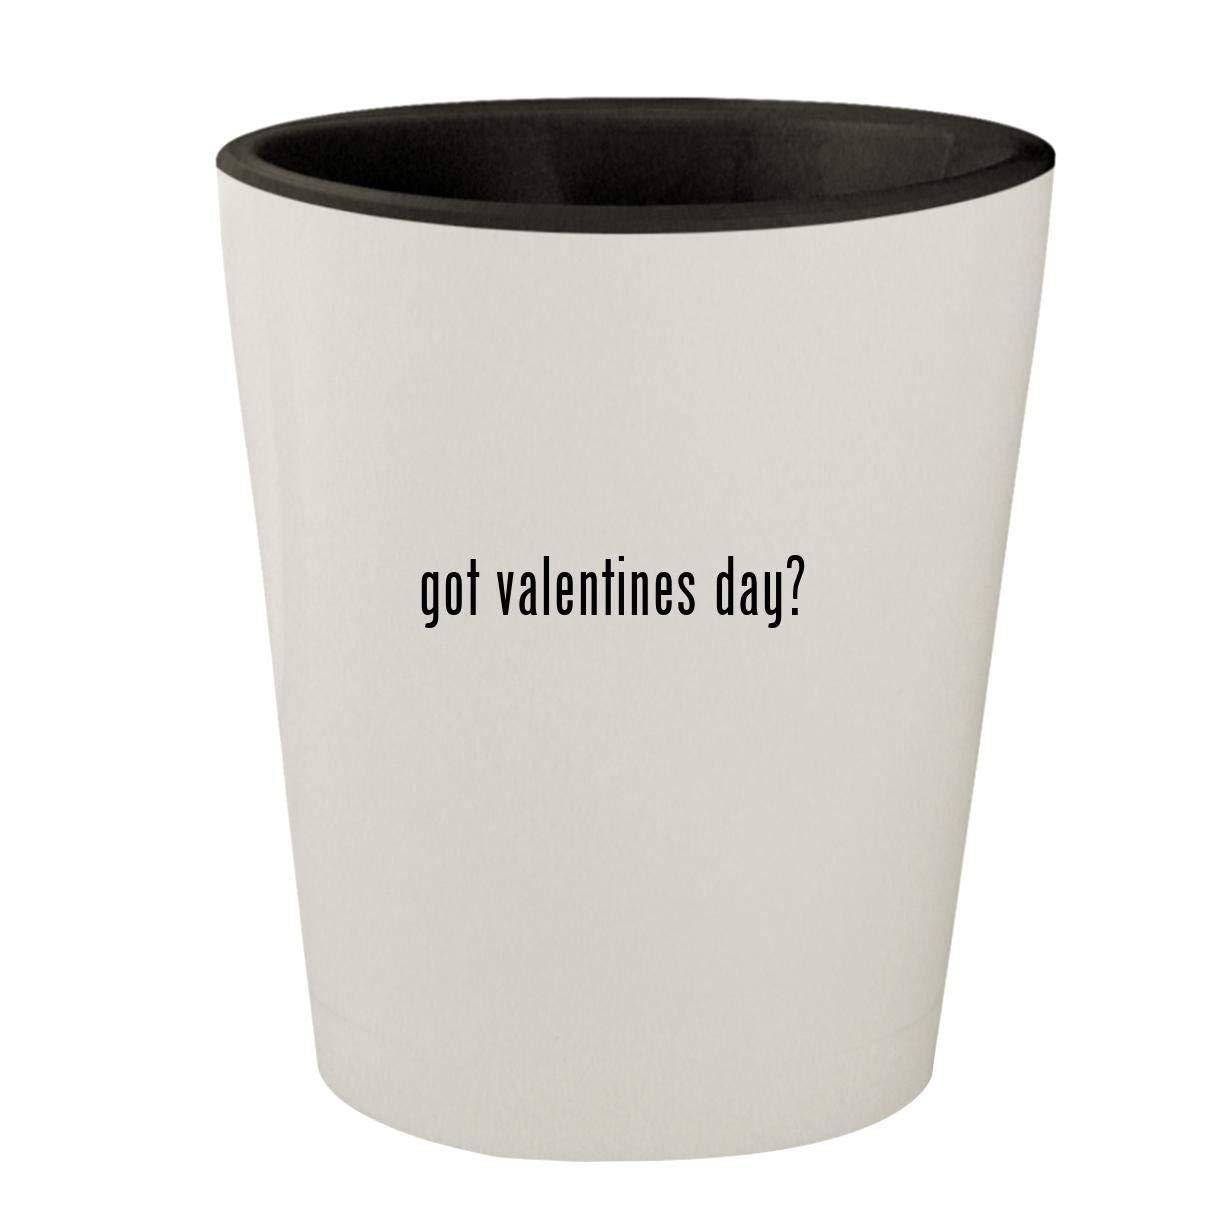 got valentines day? - White Outer & Black Inner Ceramic 1.5oz Shot Glass